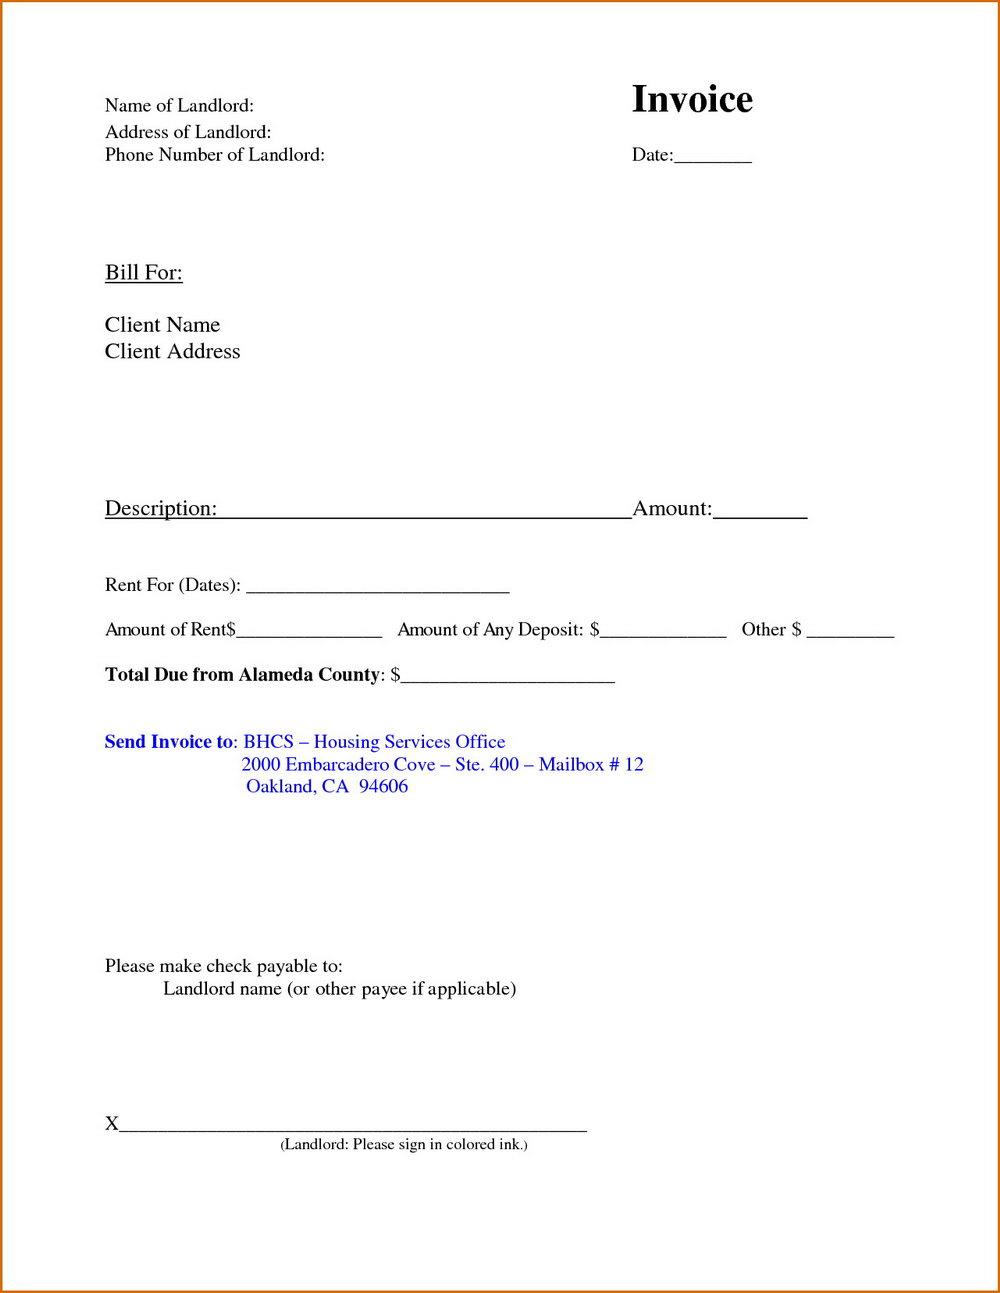 Rental Invoice Template Microsoft Word